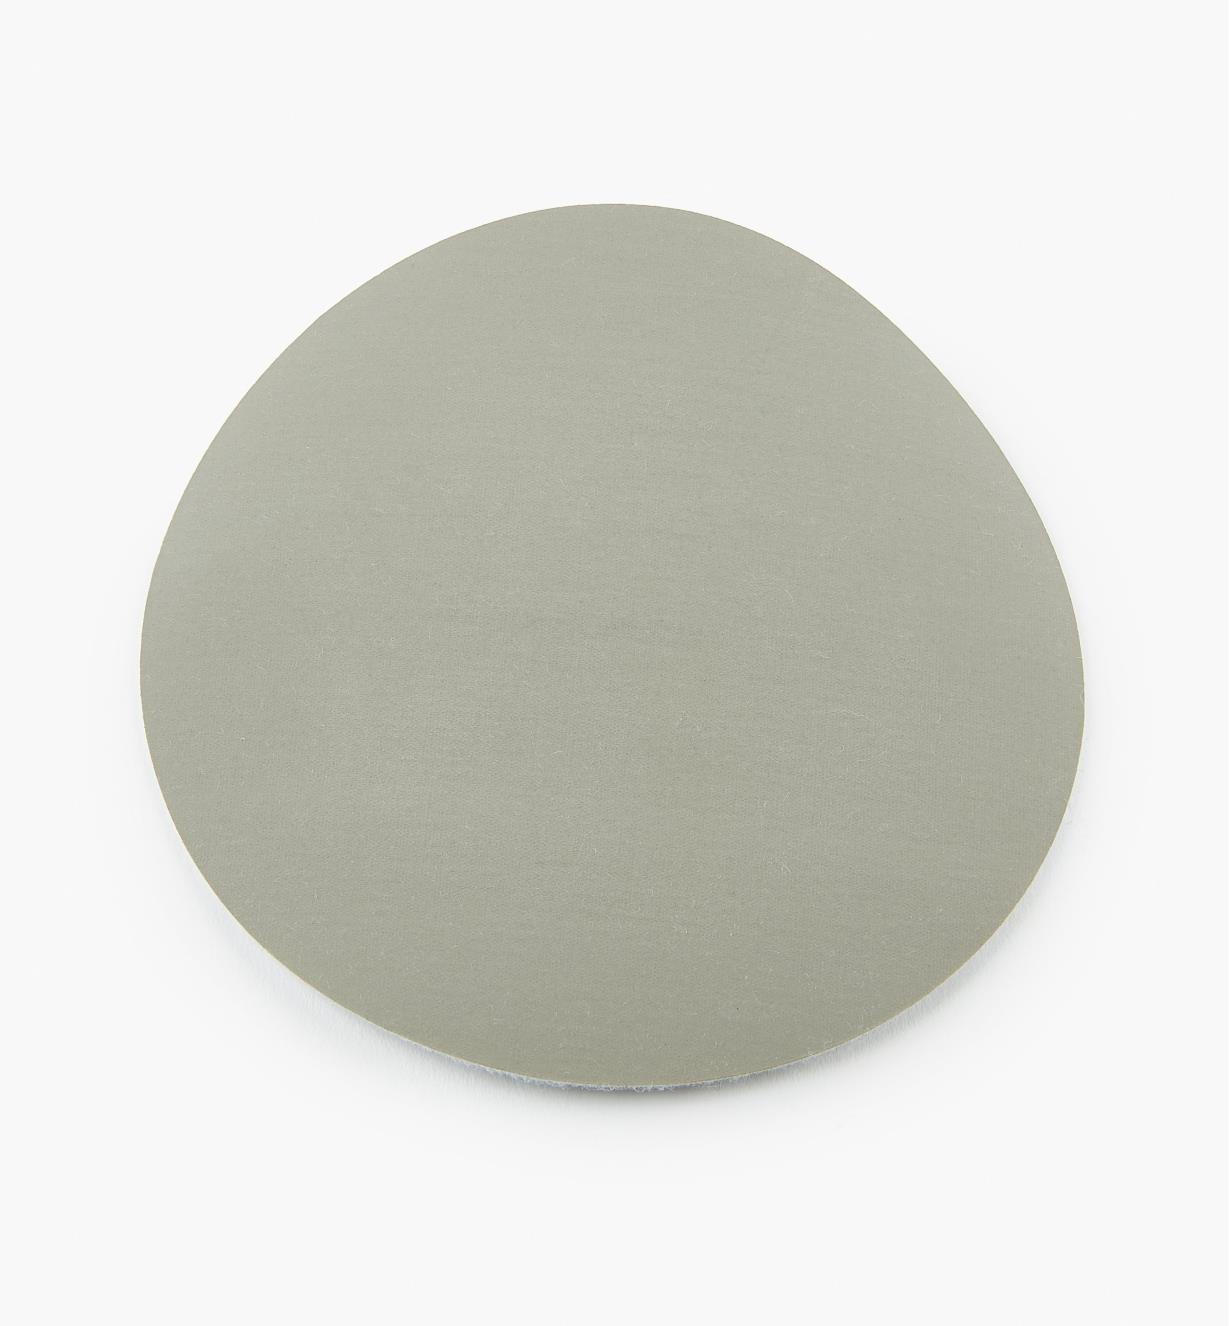 54K9036 - 8000x Micro-Mesh Disc, ea.